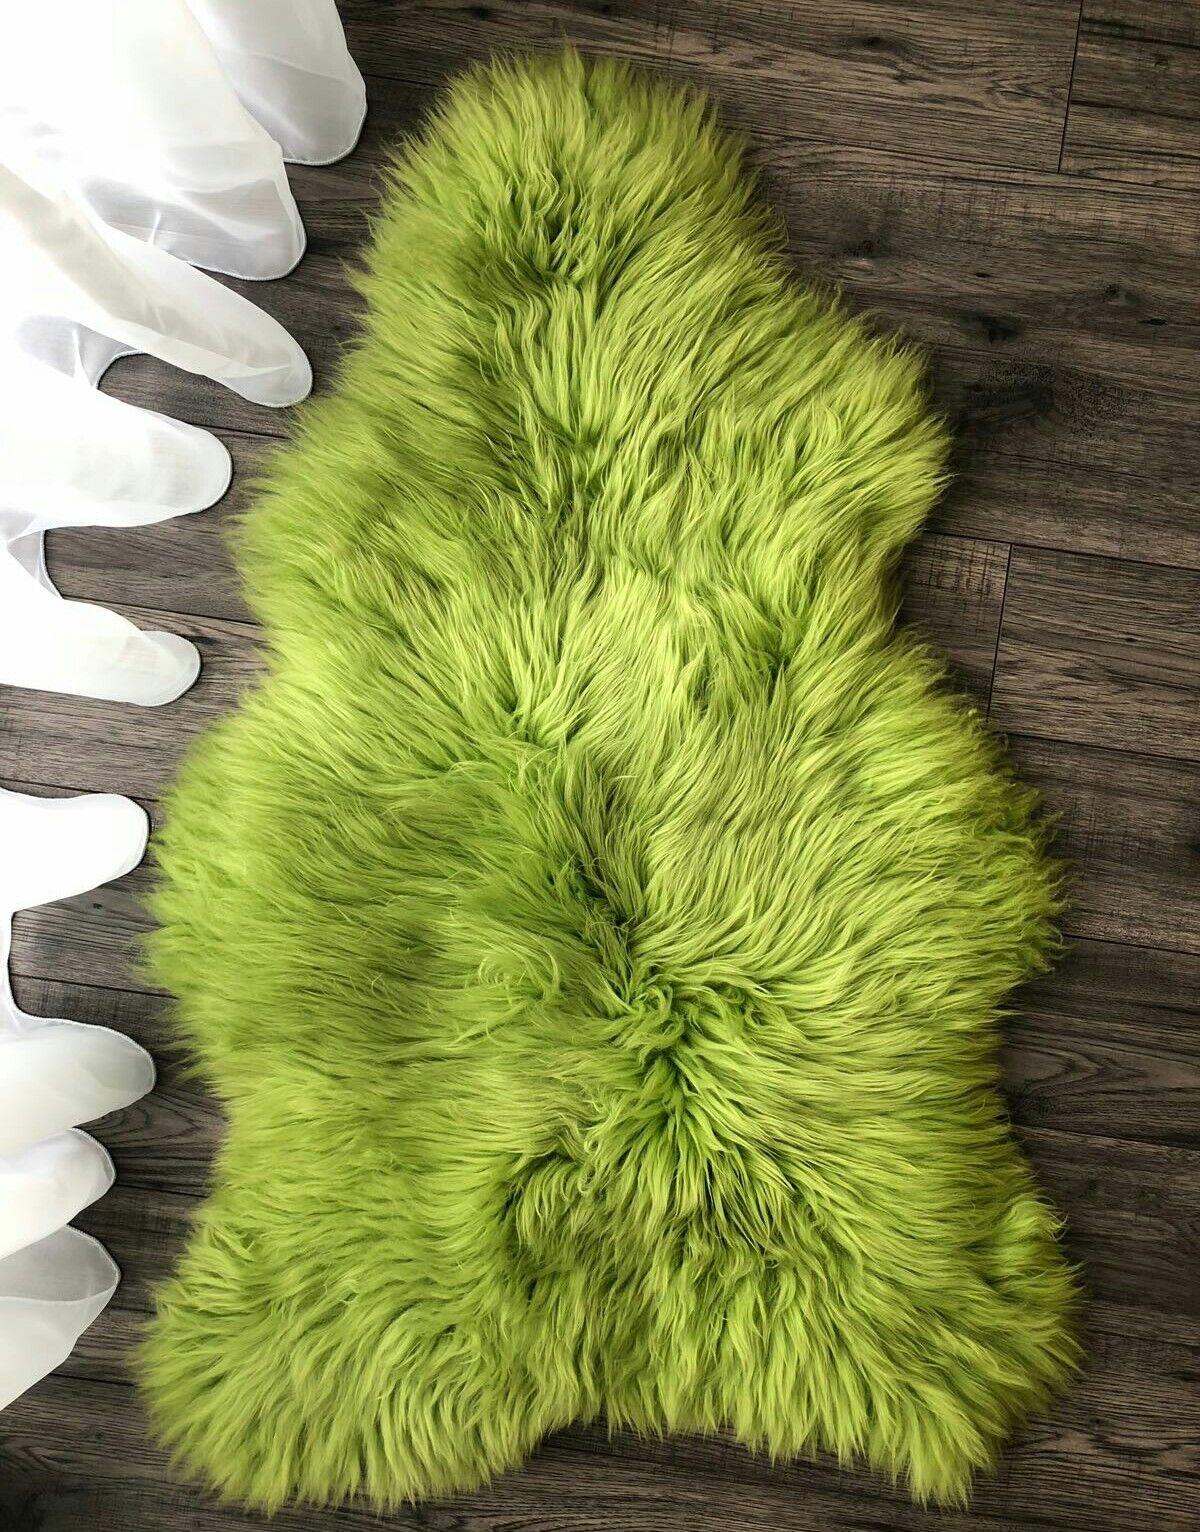 Beautiful Genuine Luxury Sheepskin Rug Soft Wool Stylish Grün Apple 120cm 48